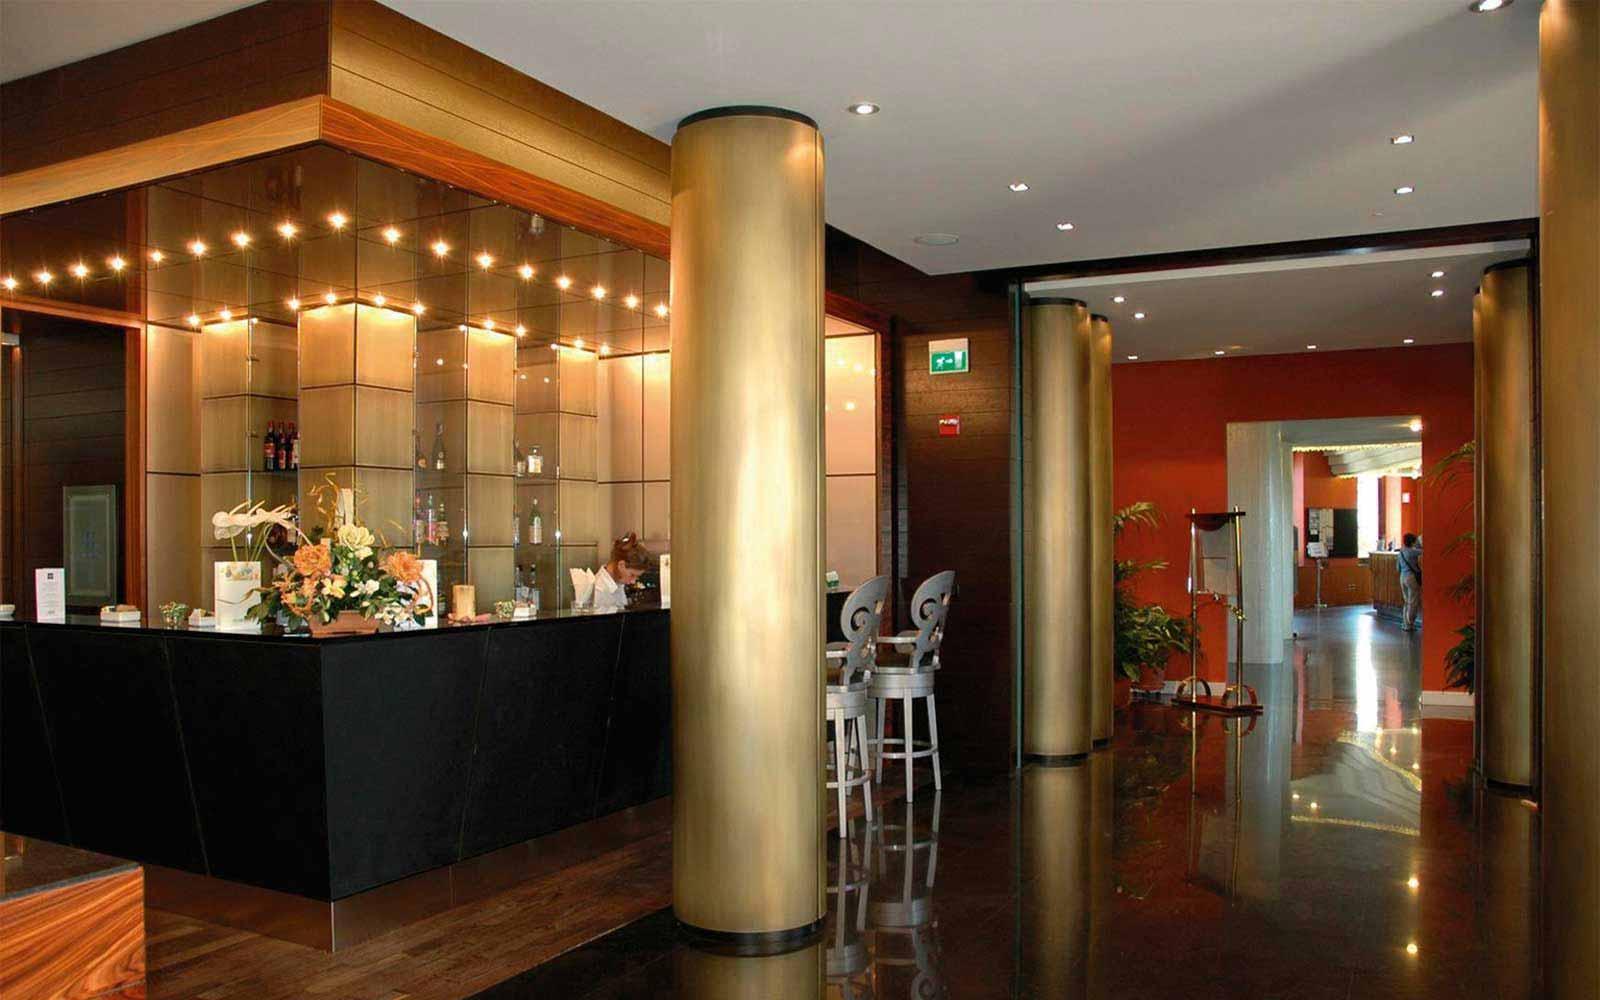 Nh Hotel Excelsior Siena  Tuscany Italy